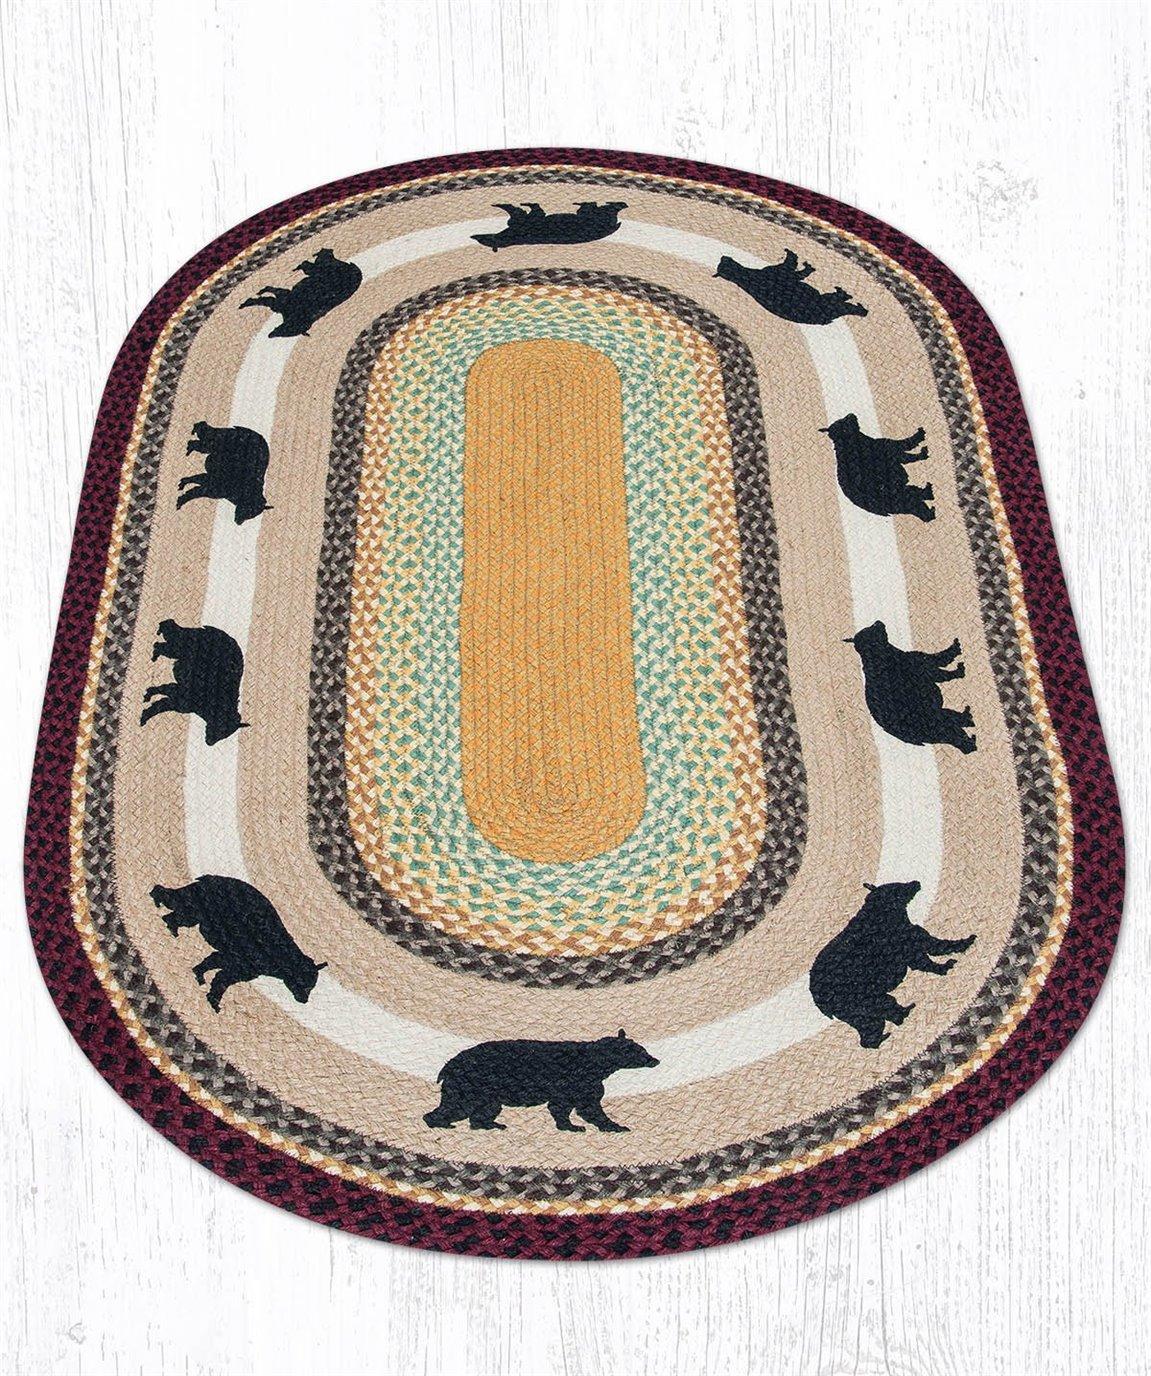 Cabin Bear Oval Braided Rug 3'x5'